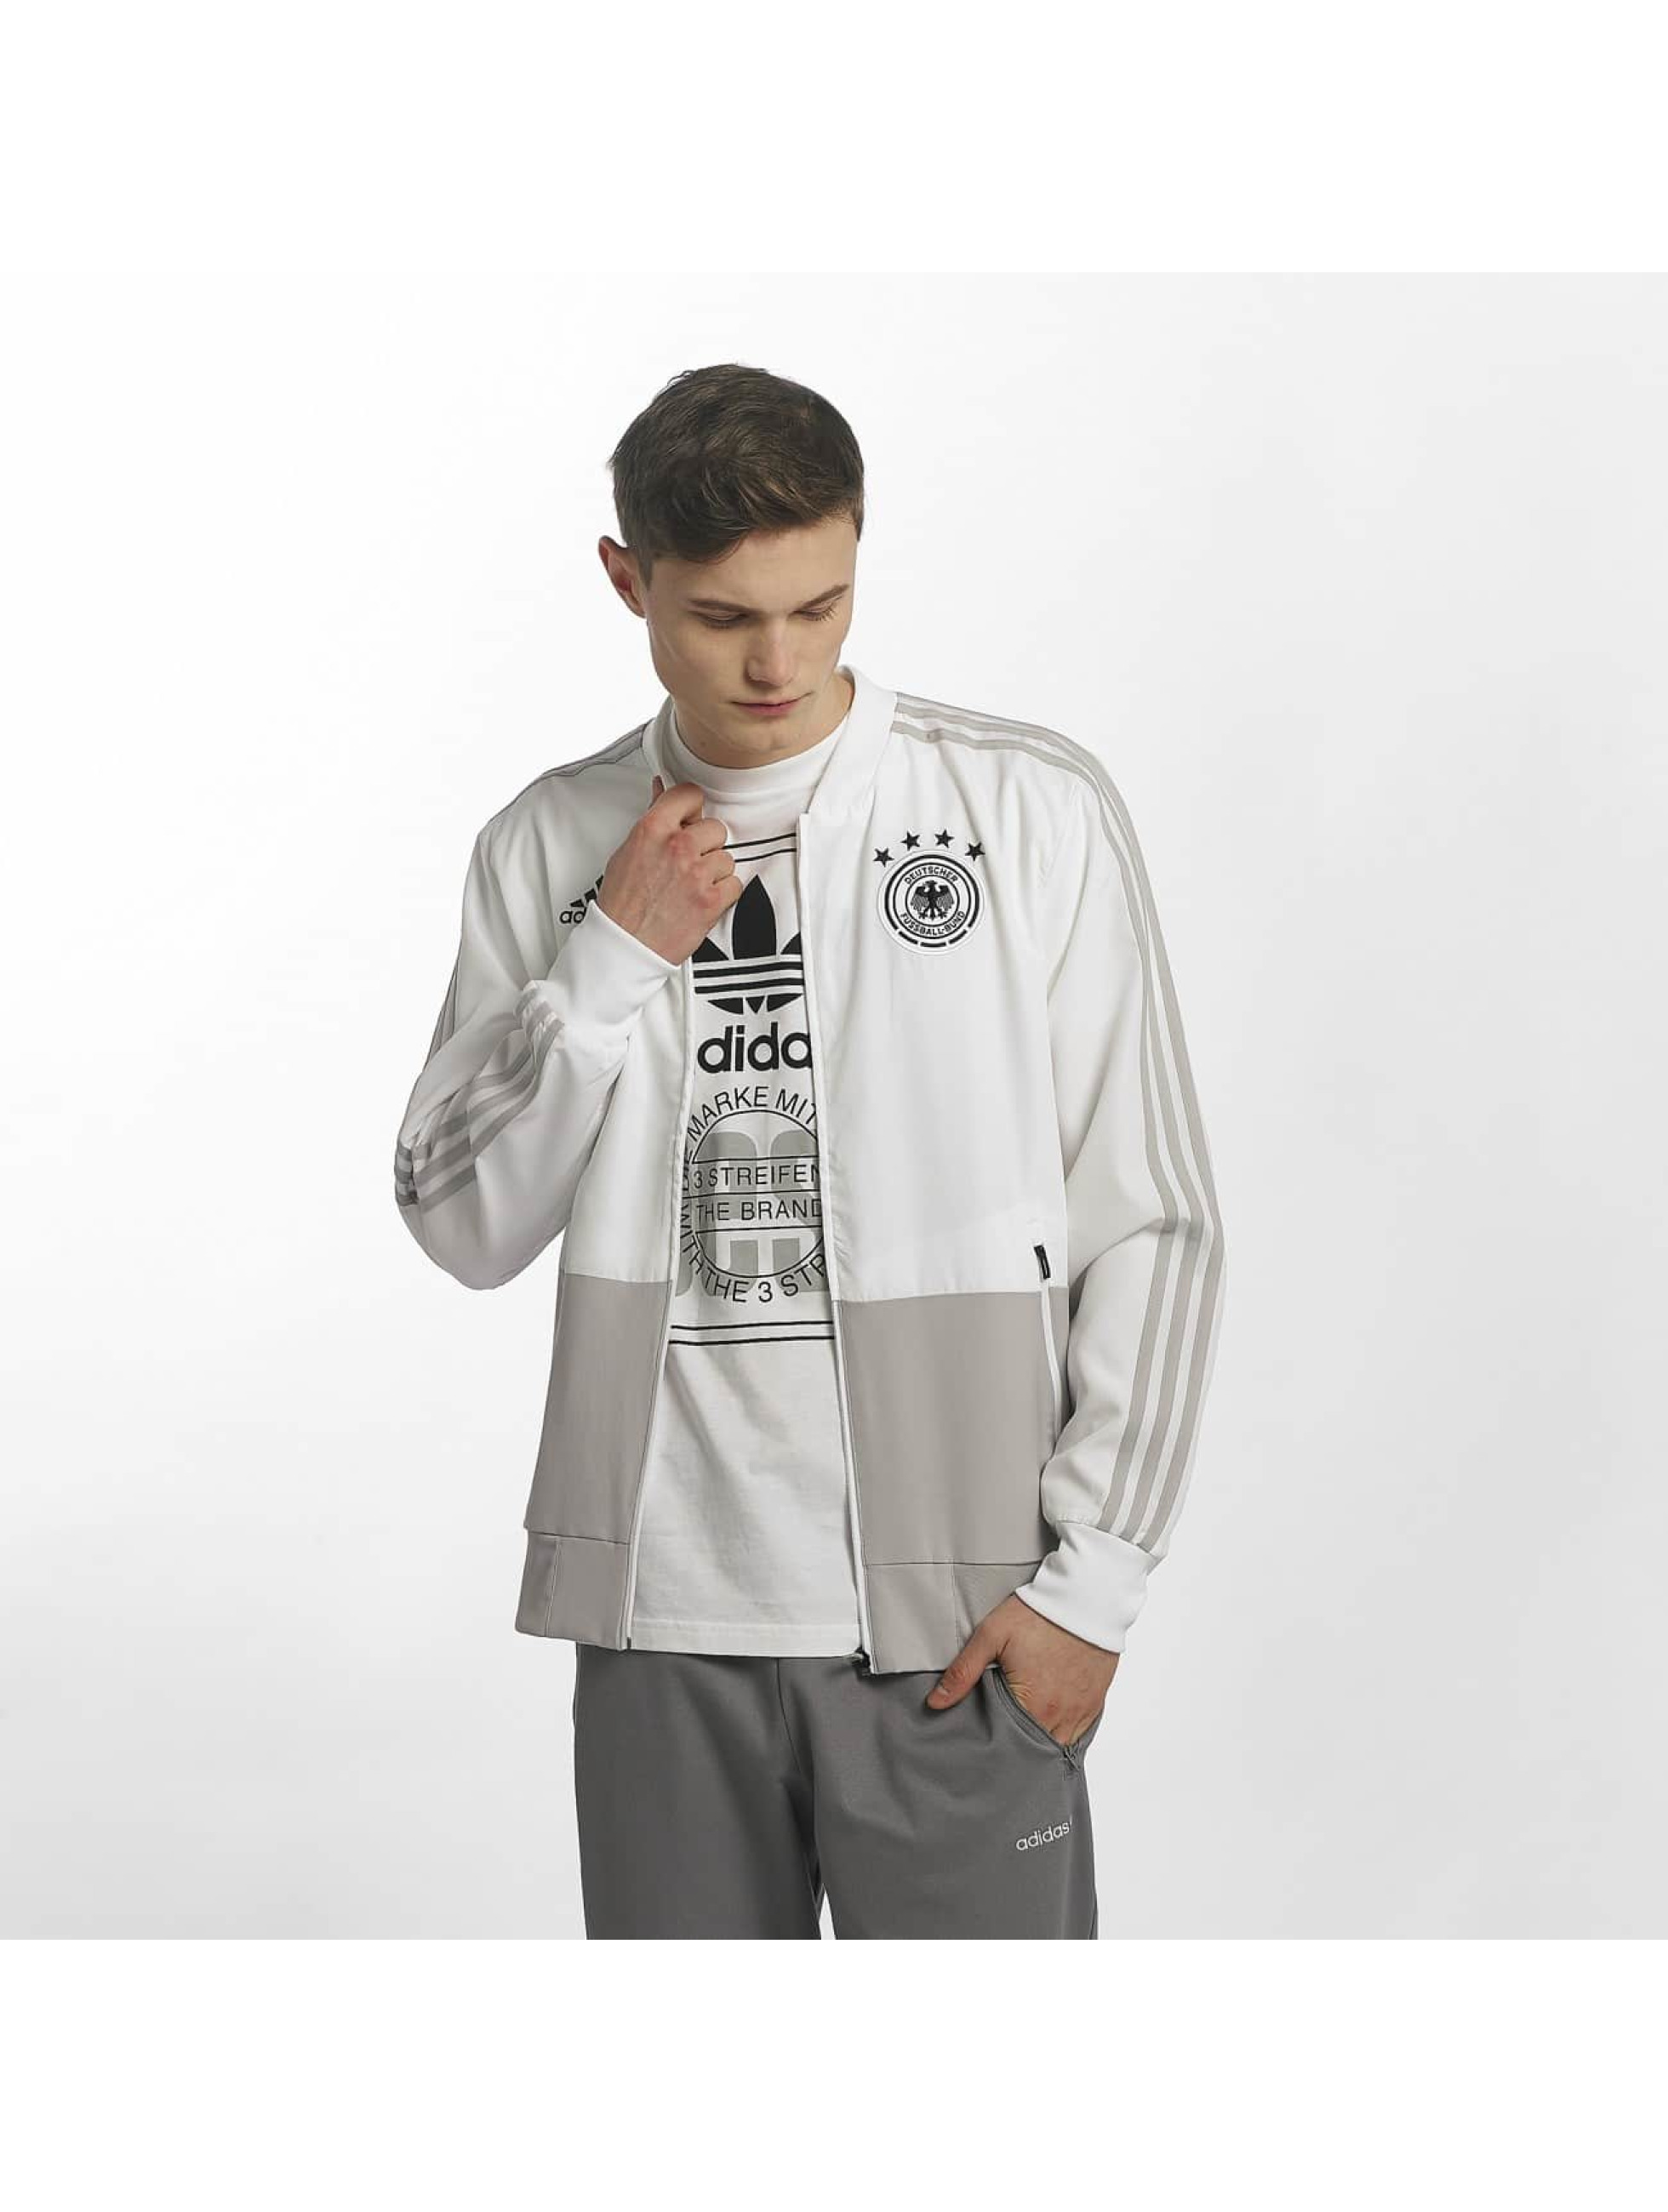 456618 In Weiß Herren Adidas Dfb Performance Übergangsjacke